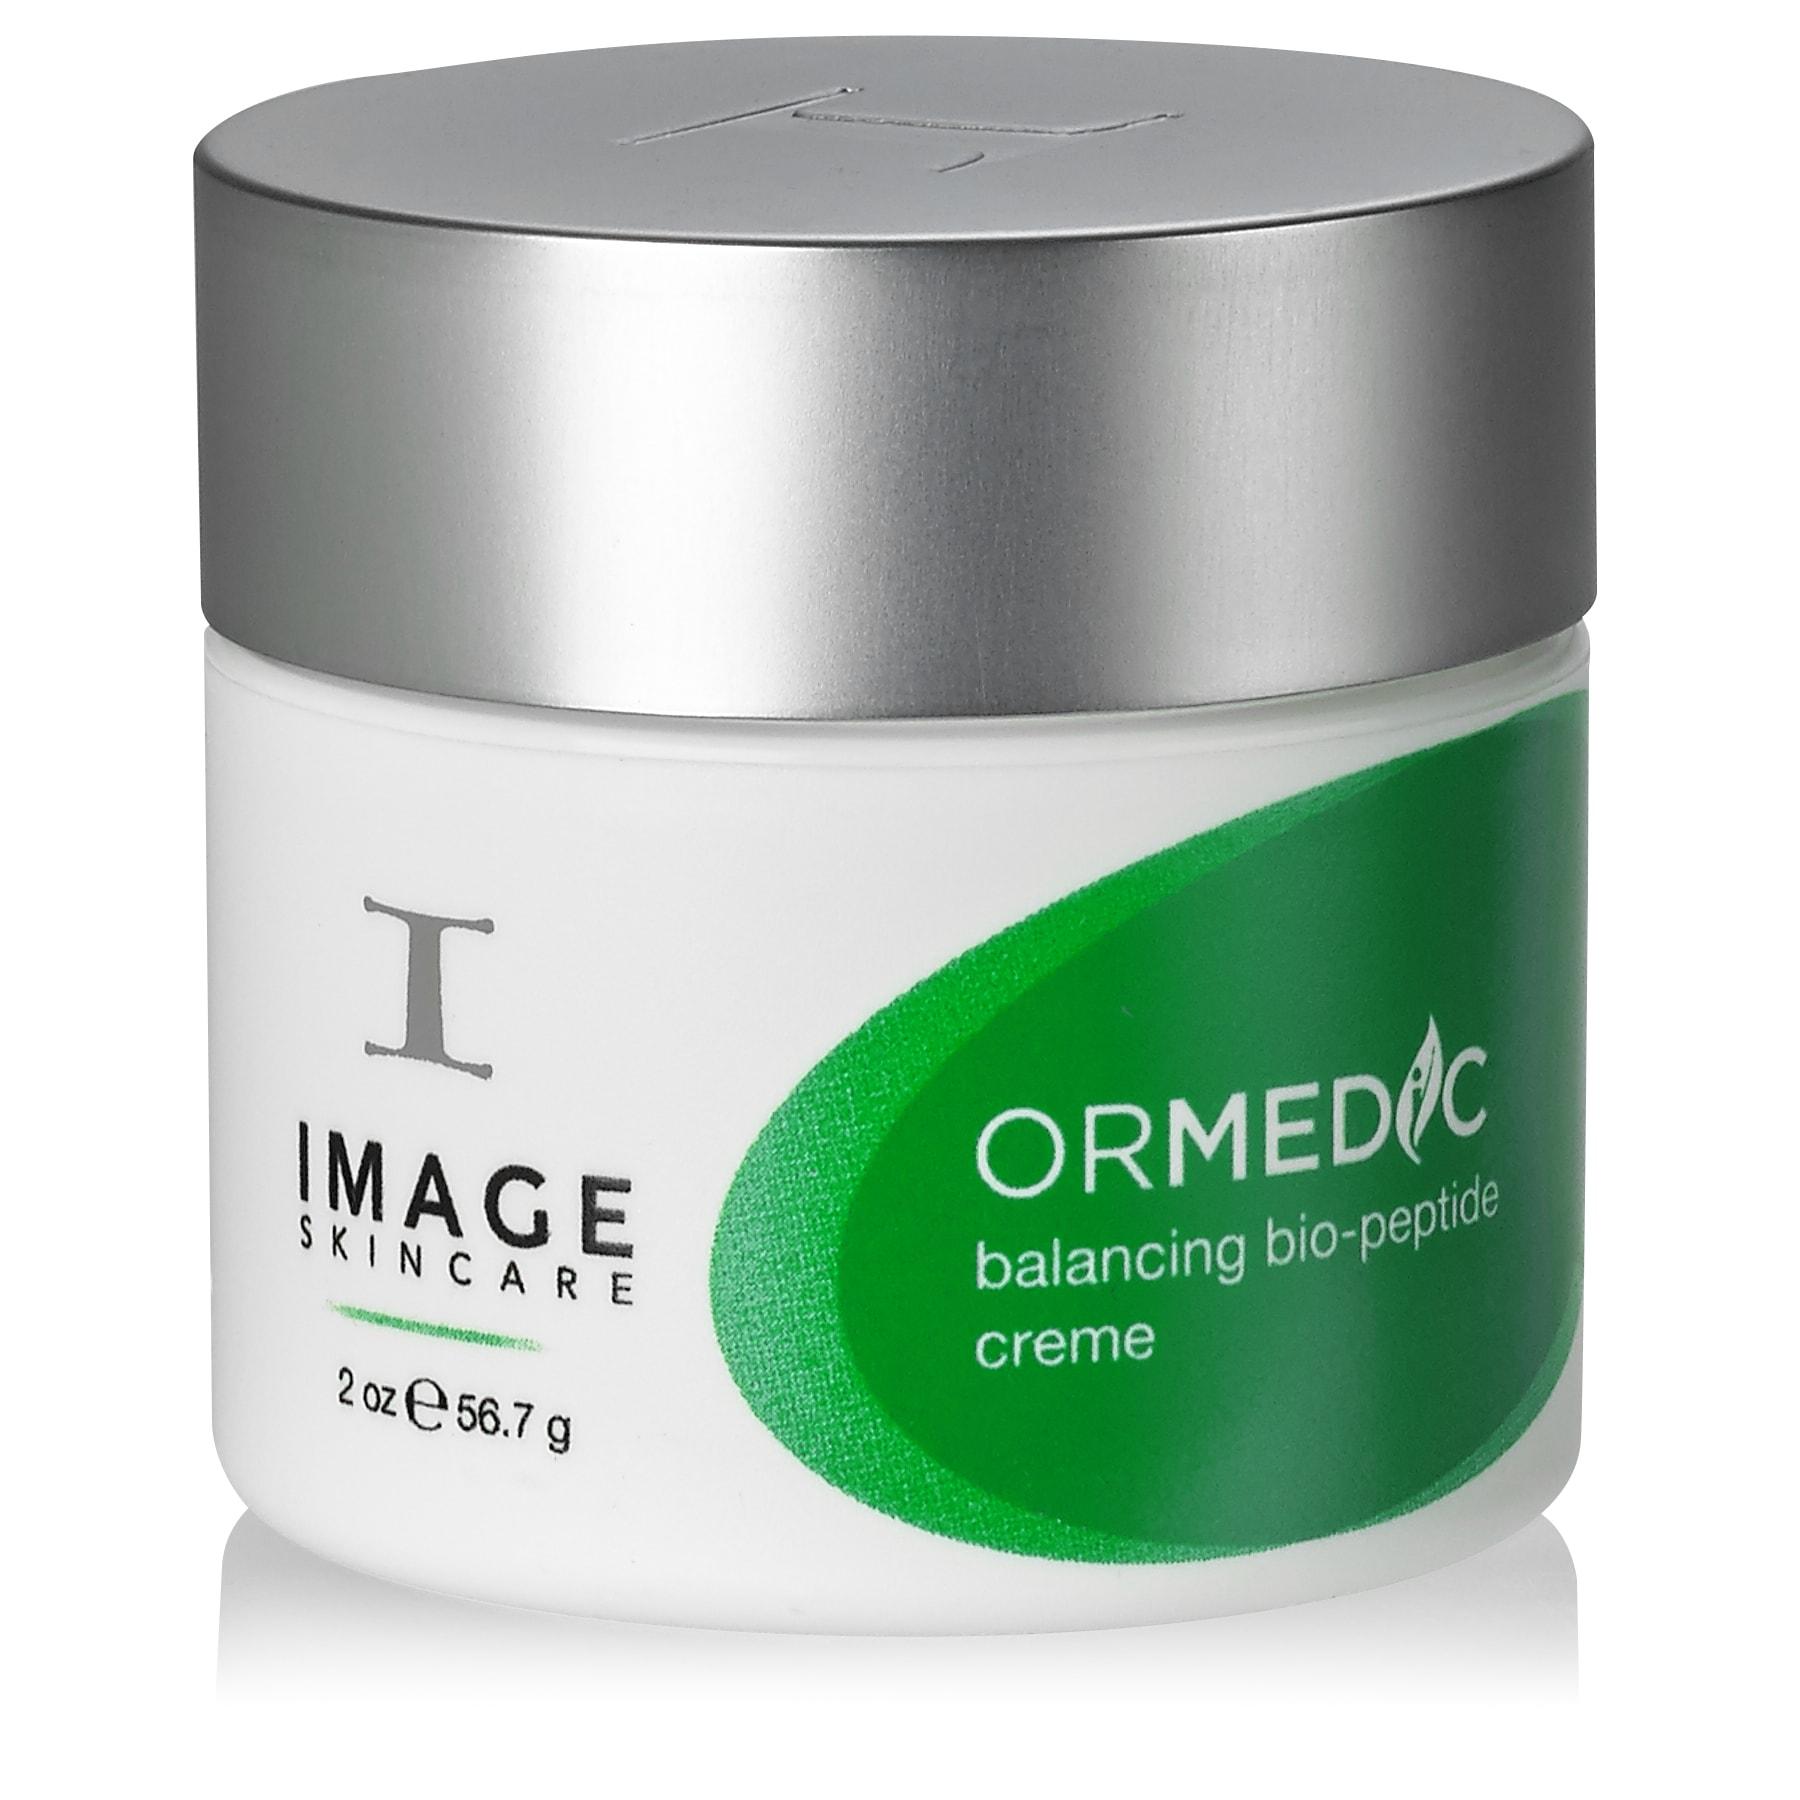 Shop Image Skincare Ormedic Balancing 2 Ounce Bio Peptide Creme